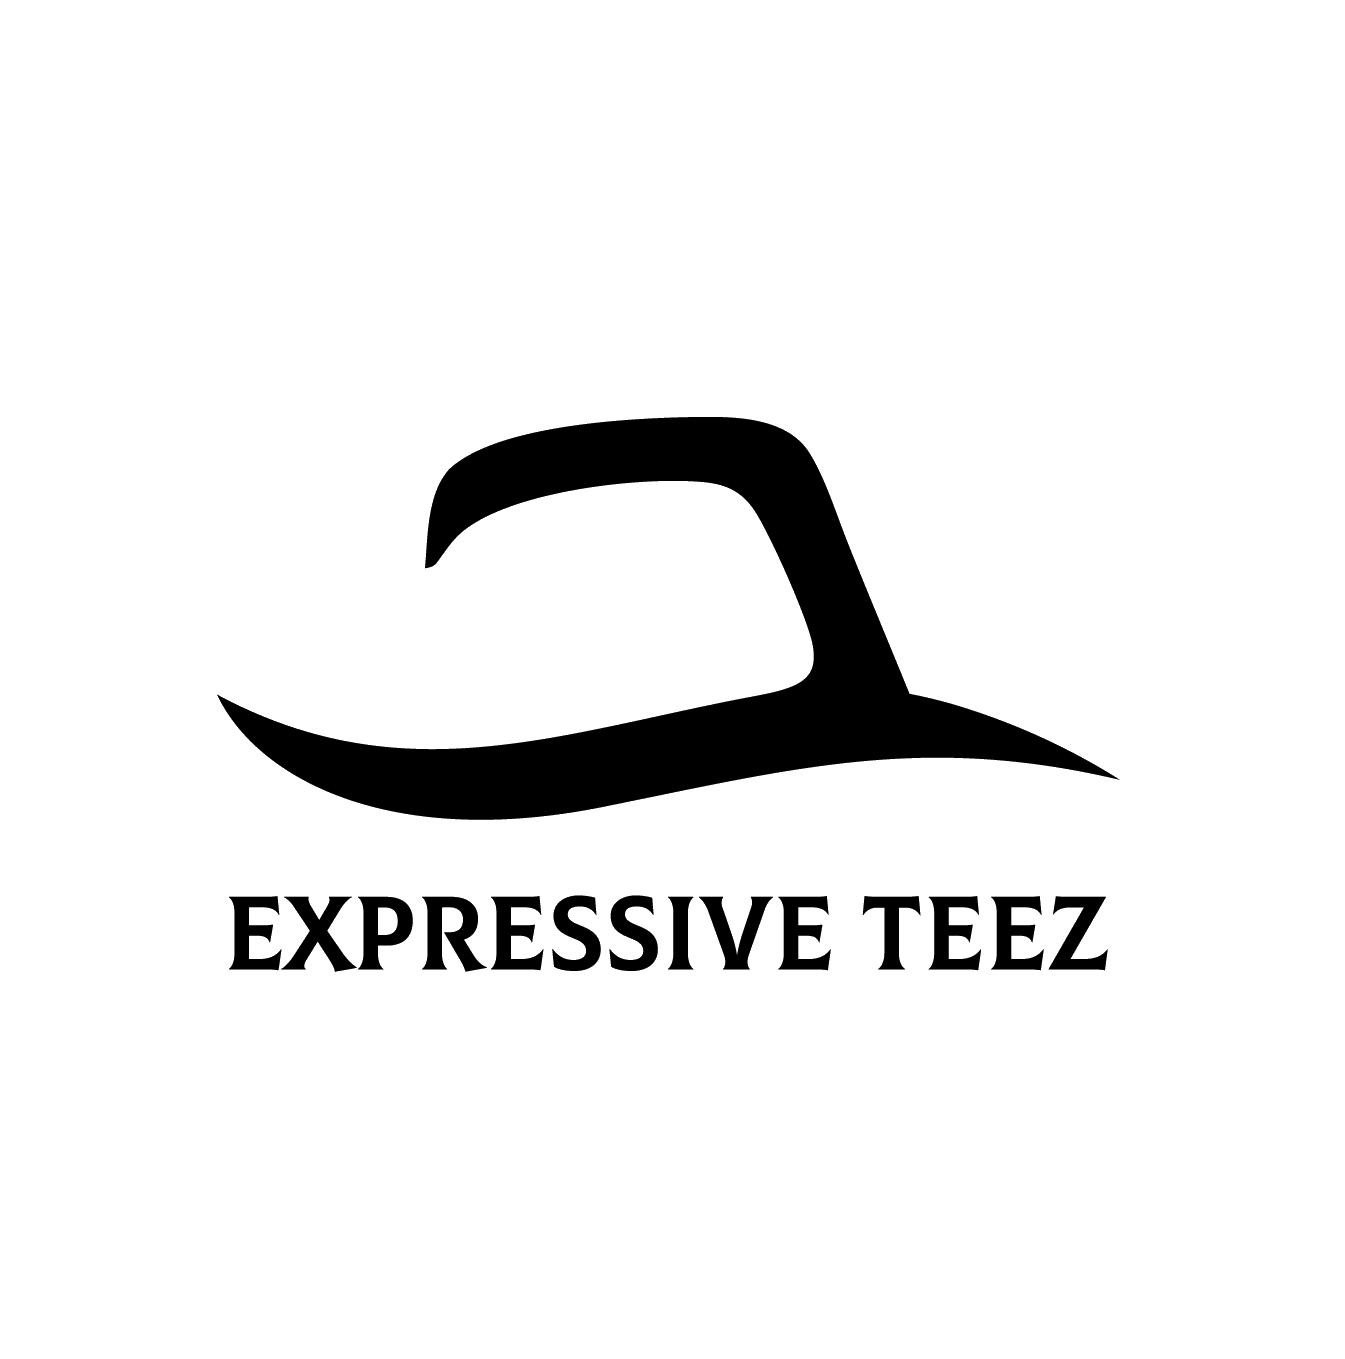 Expressive Teez logo